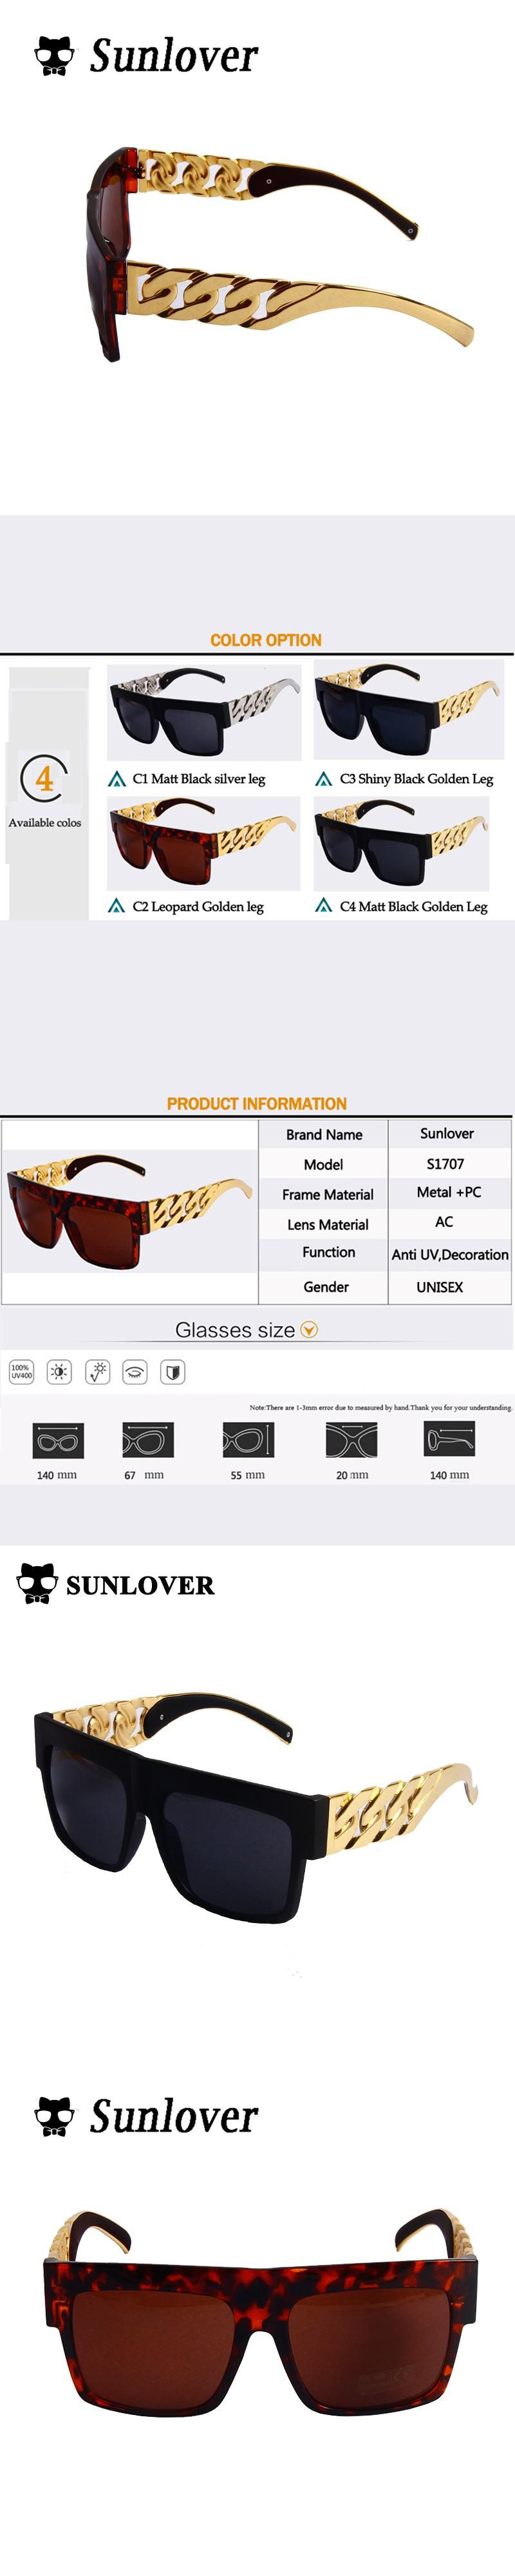 9c44c0dd51e SUNLOVER Kim kardashian Sunglasses Beyonce Celebrities Metal Gold Chain Sun  glasses Oversized Brand Designer Women Shades